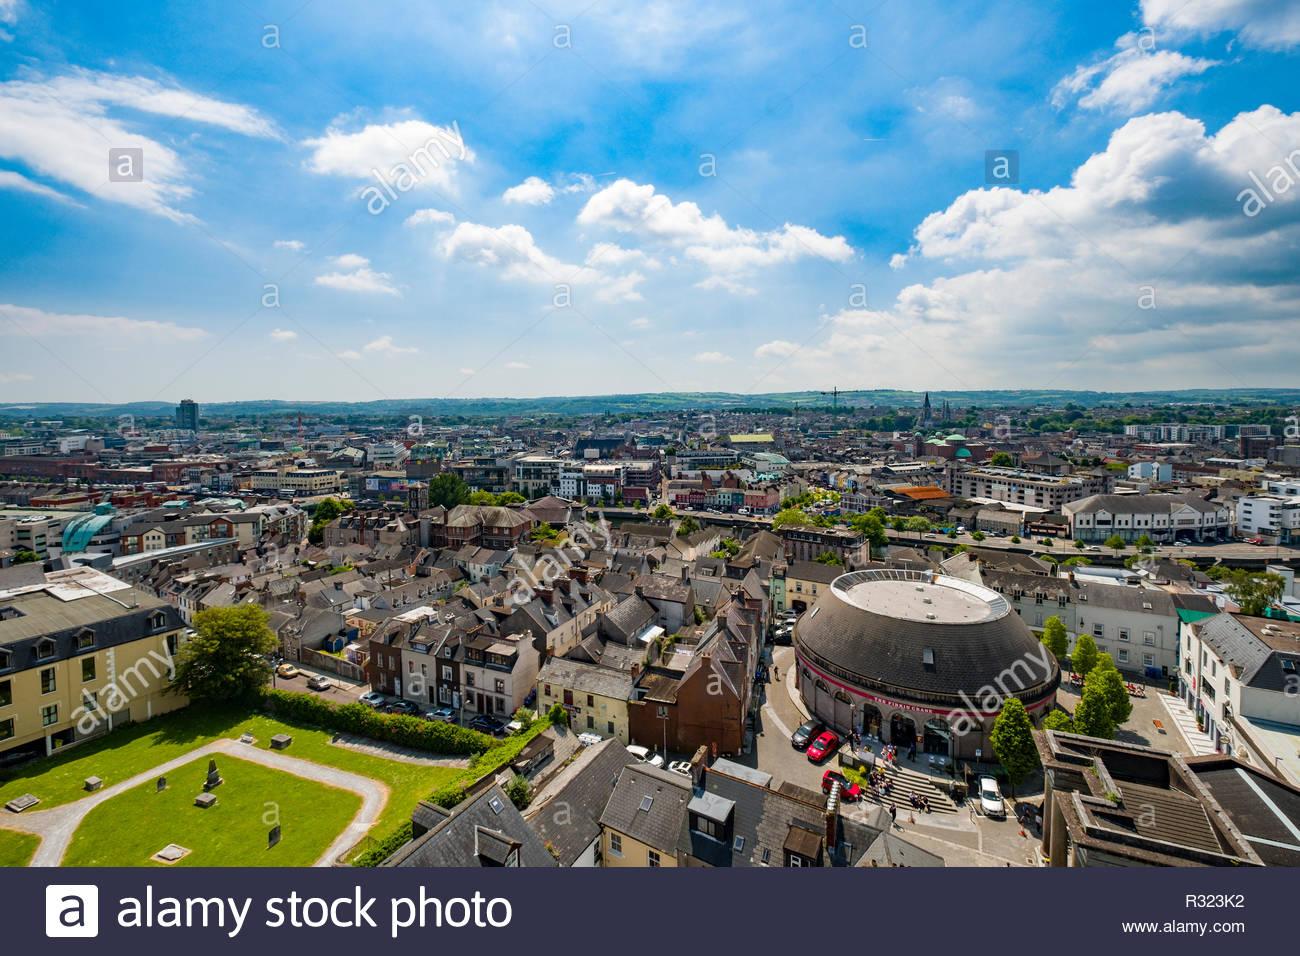 Cork City - Buildings of Ireland